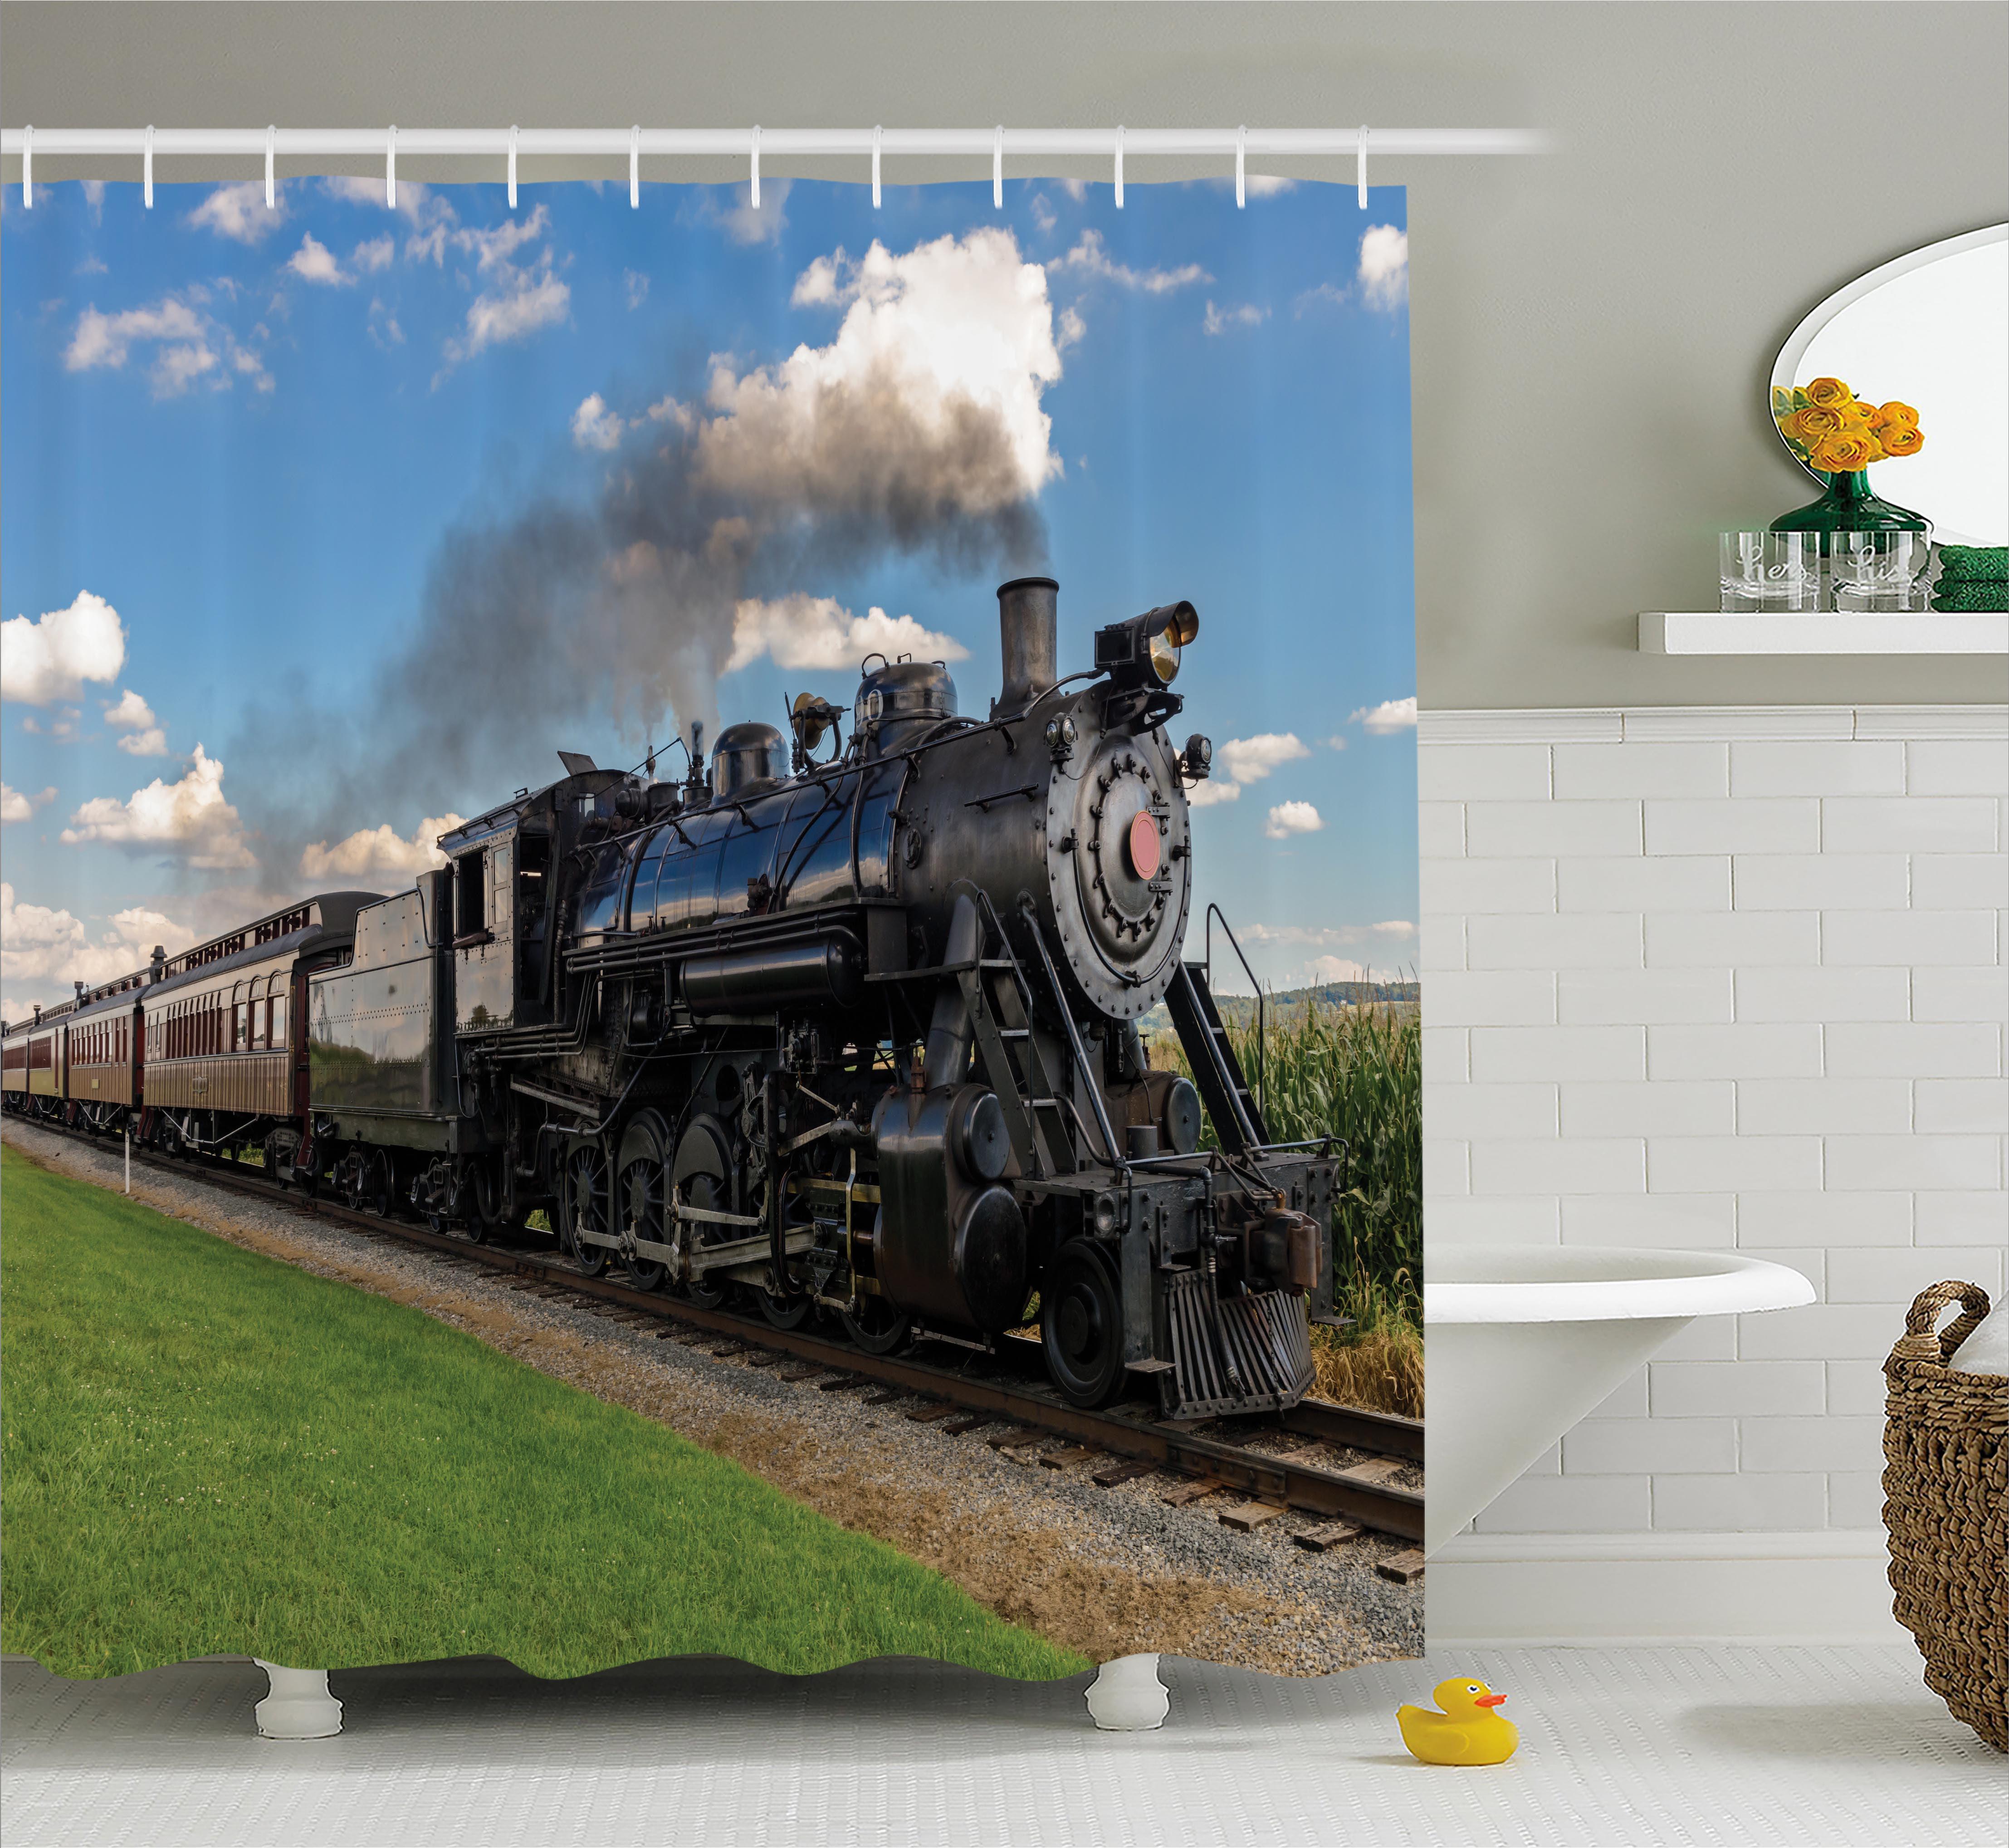 Steam Engine Shower Curtain, Vintage Locomotive in Countr...